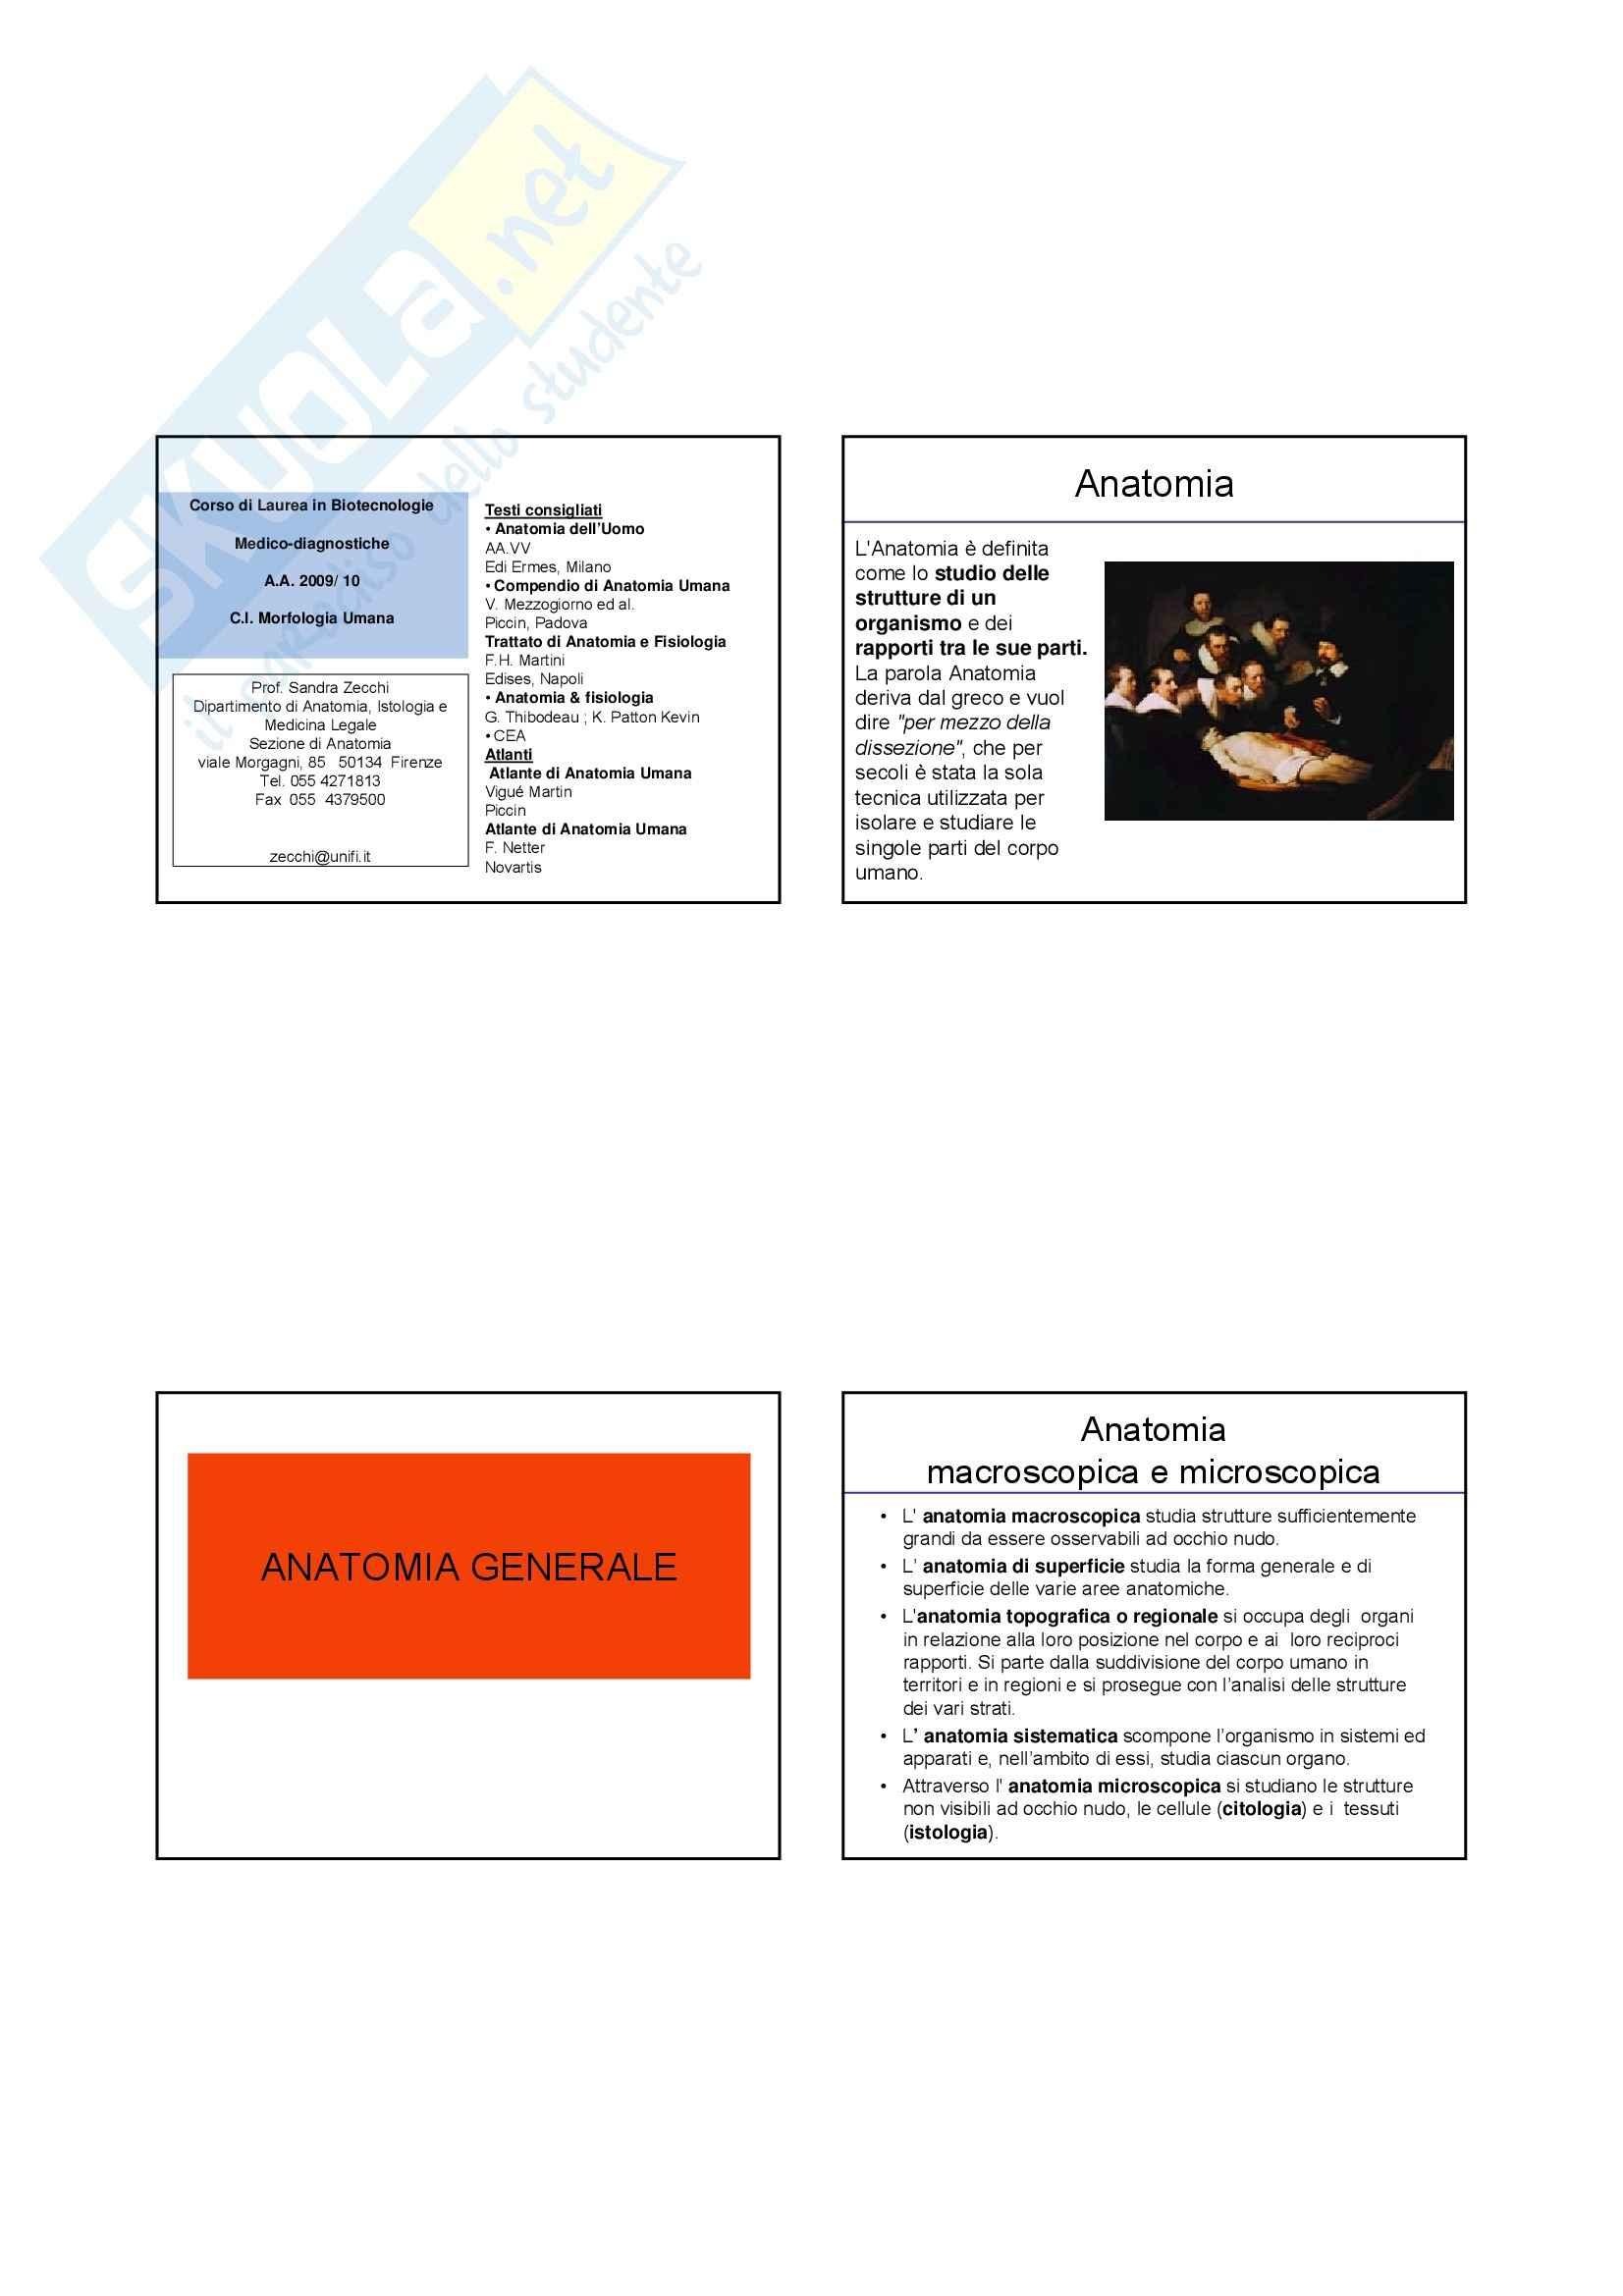 Anatomia I - Anatomia Generale – Slides 1